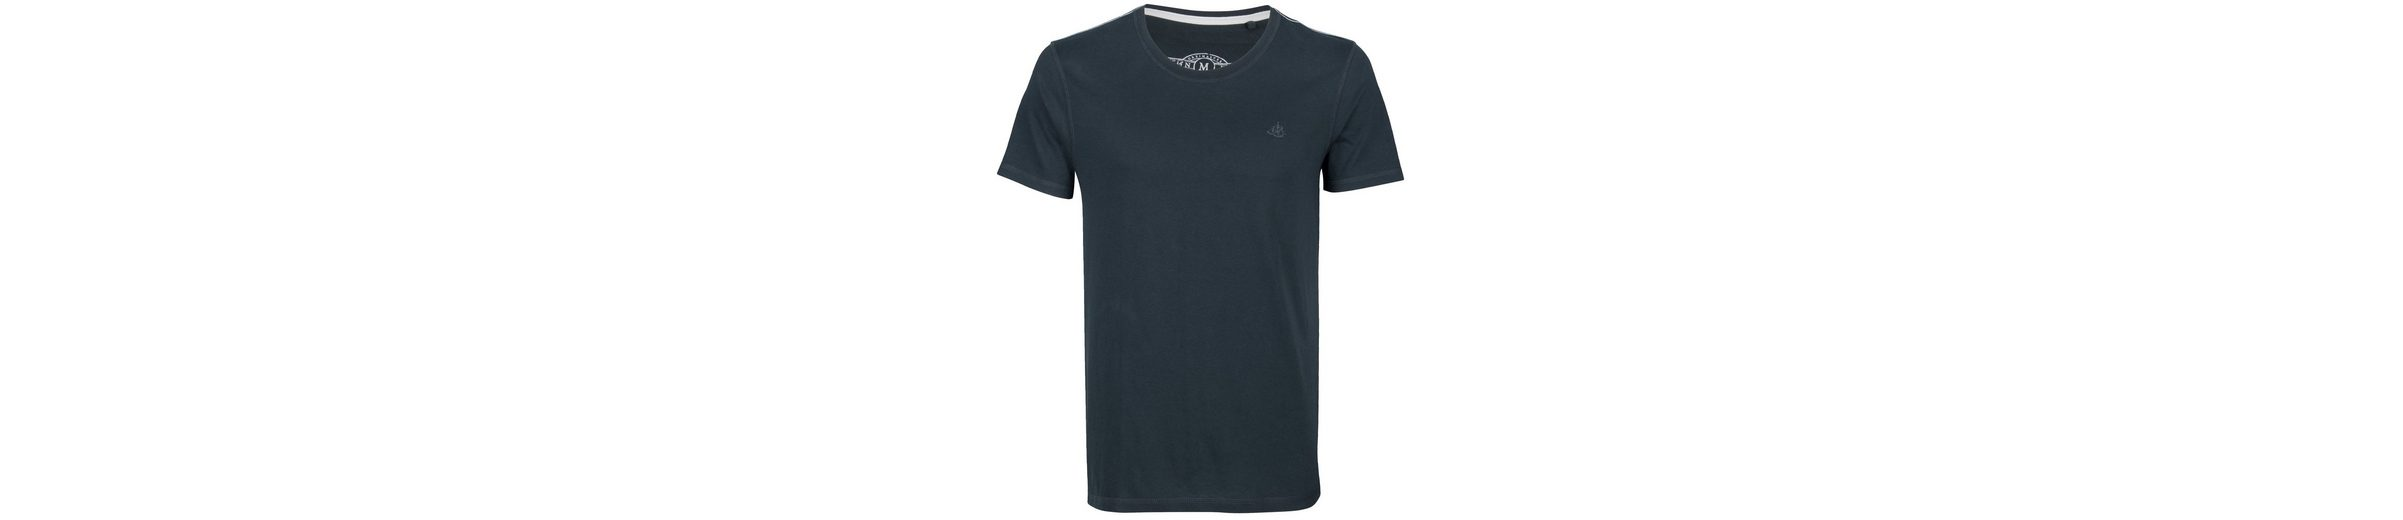 DREIMASTER T-Shirt Verkauf Fabrikverkauf ieF6QfT